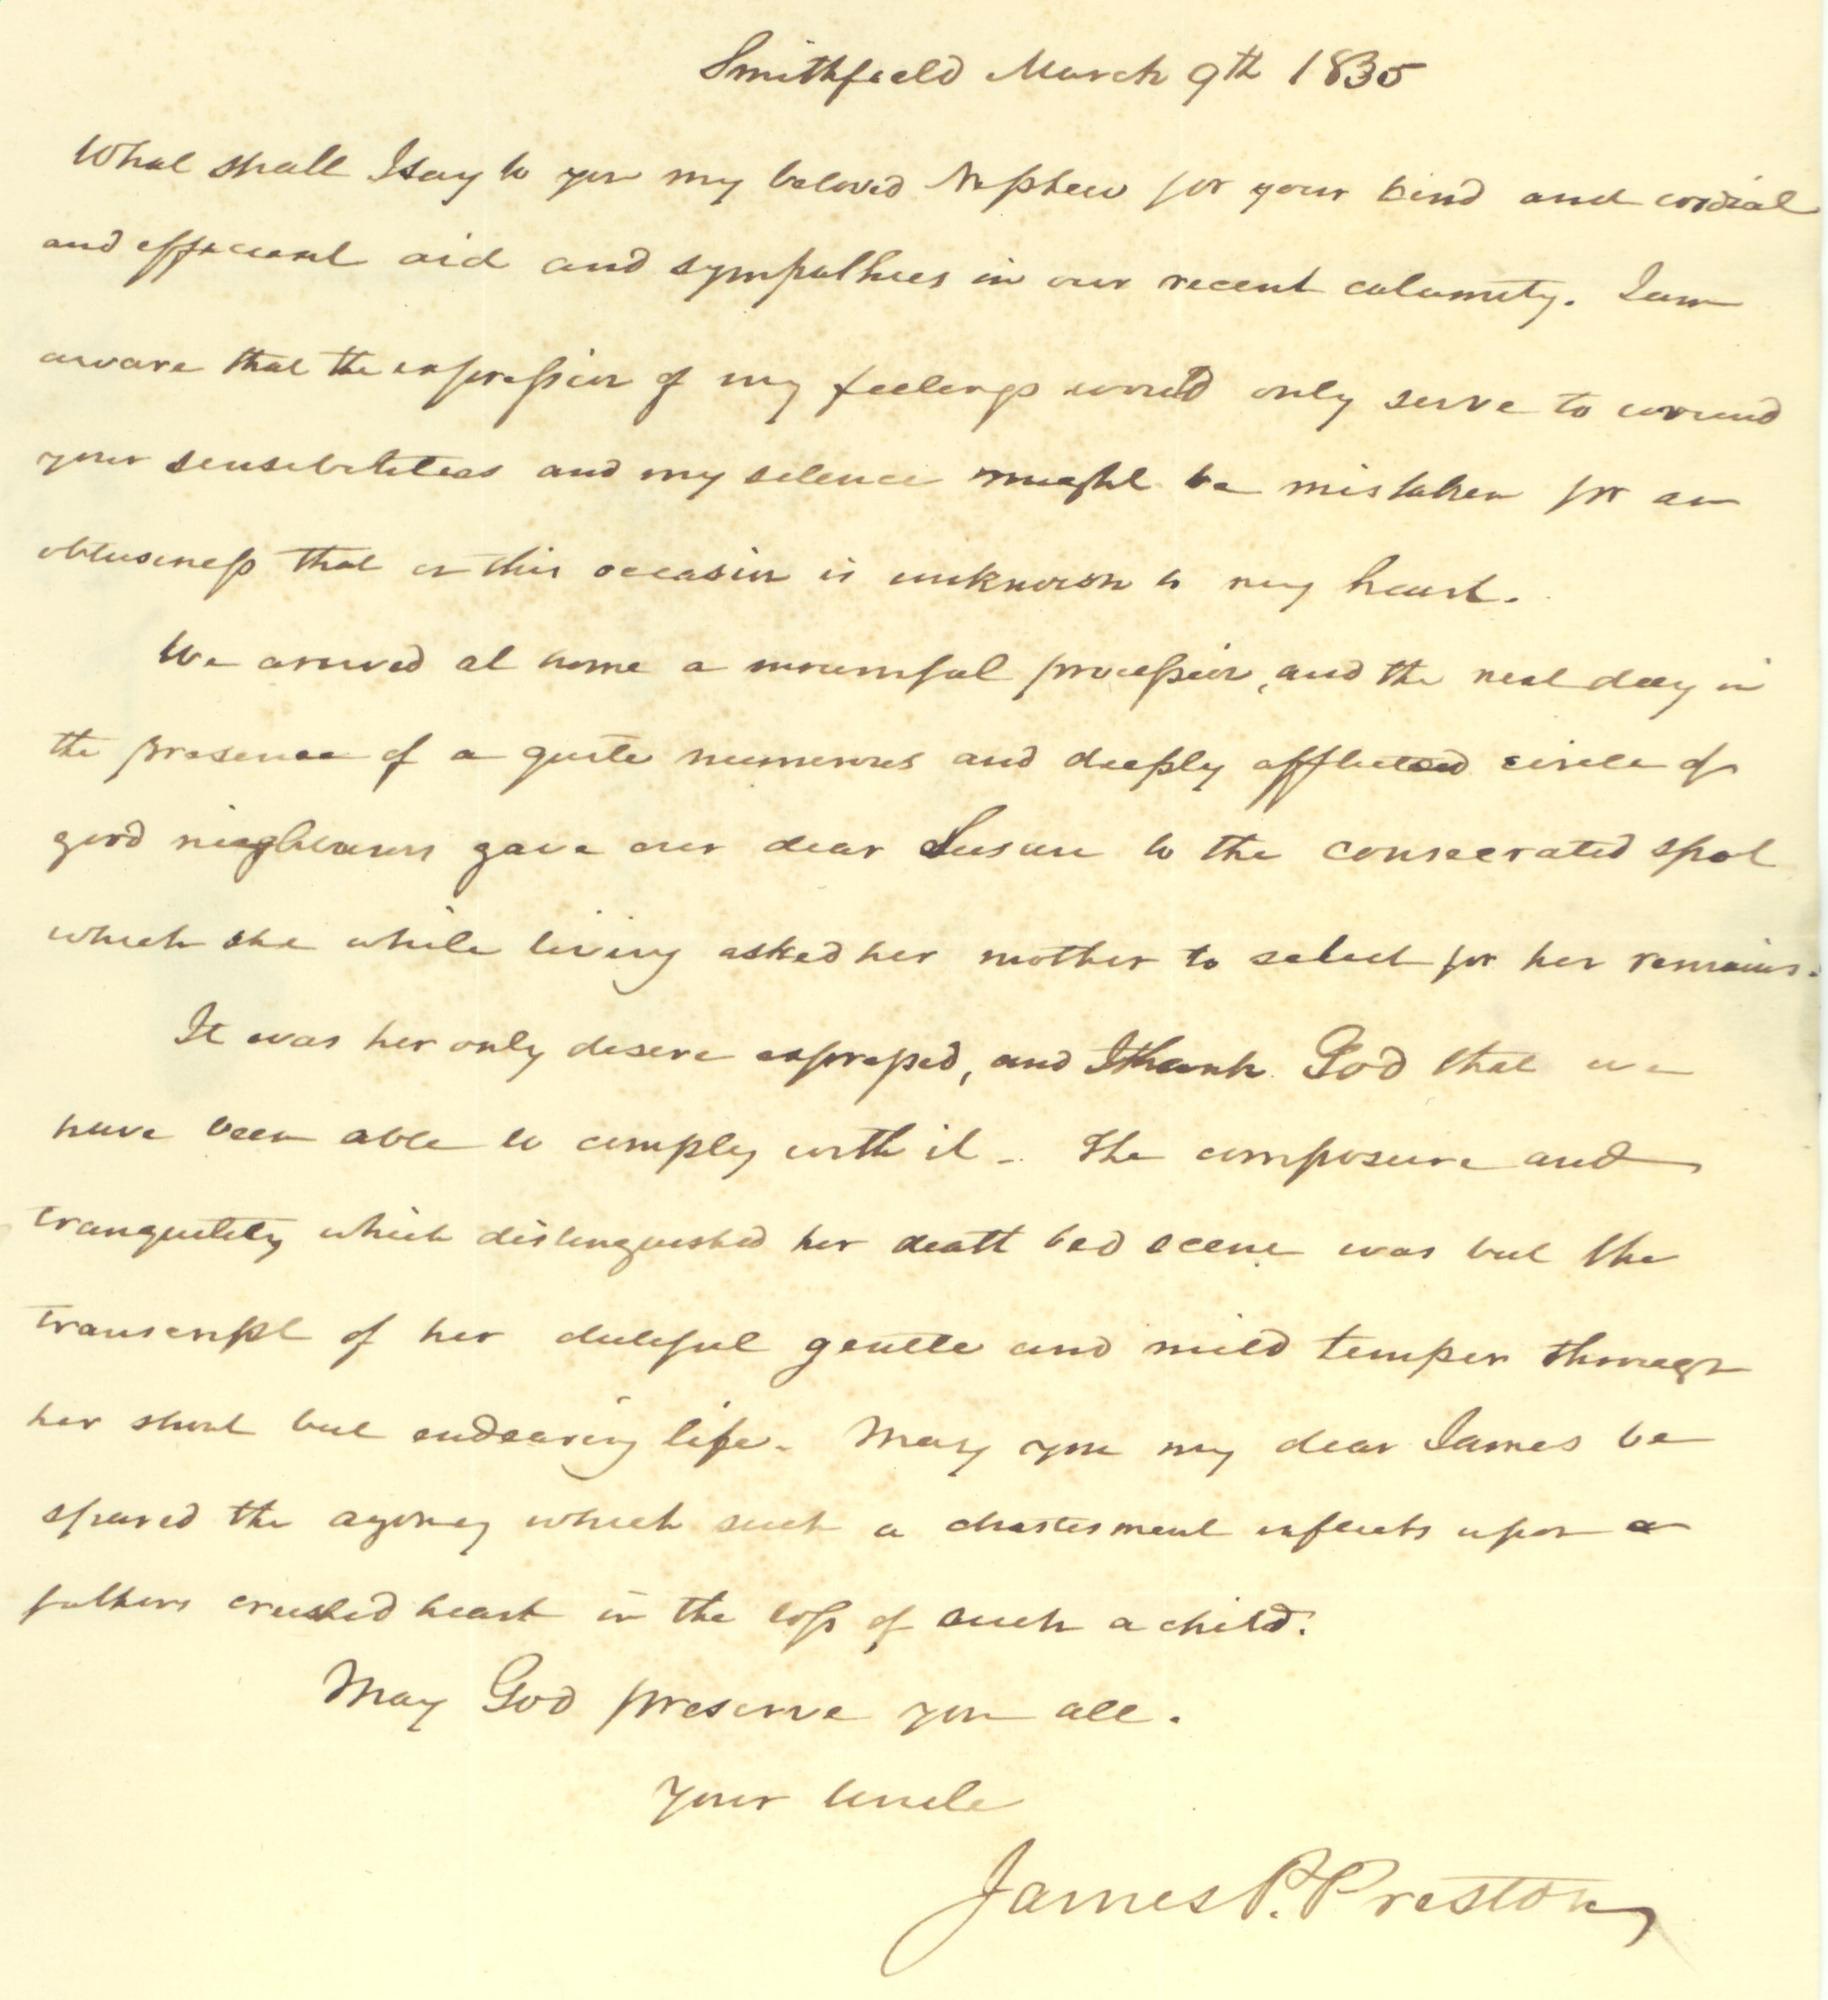 Ms1997_002_SmithfieldPreston_Letter_1835_0309.jpg